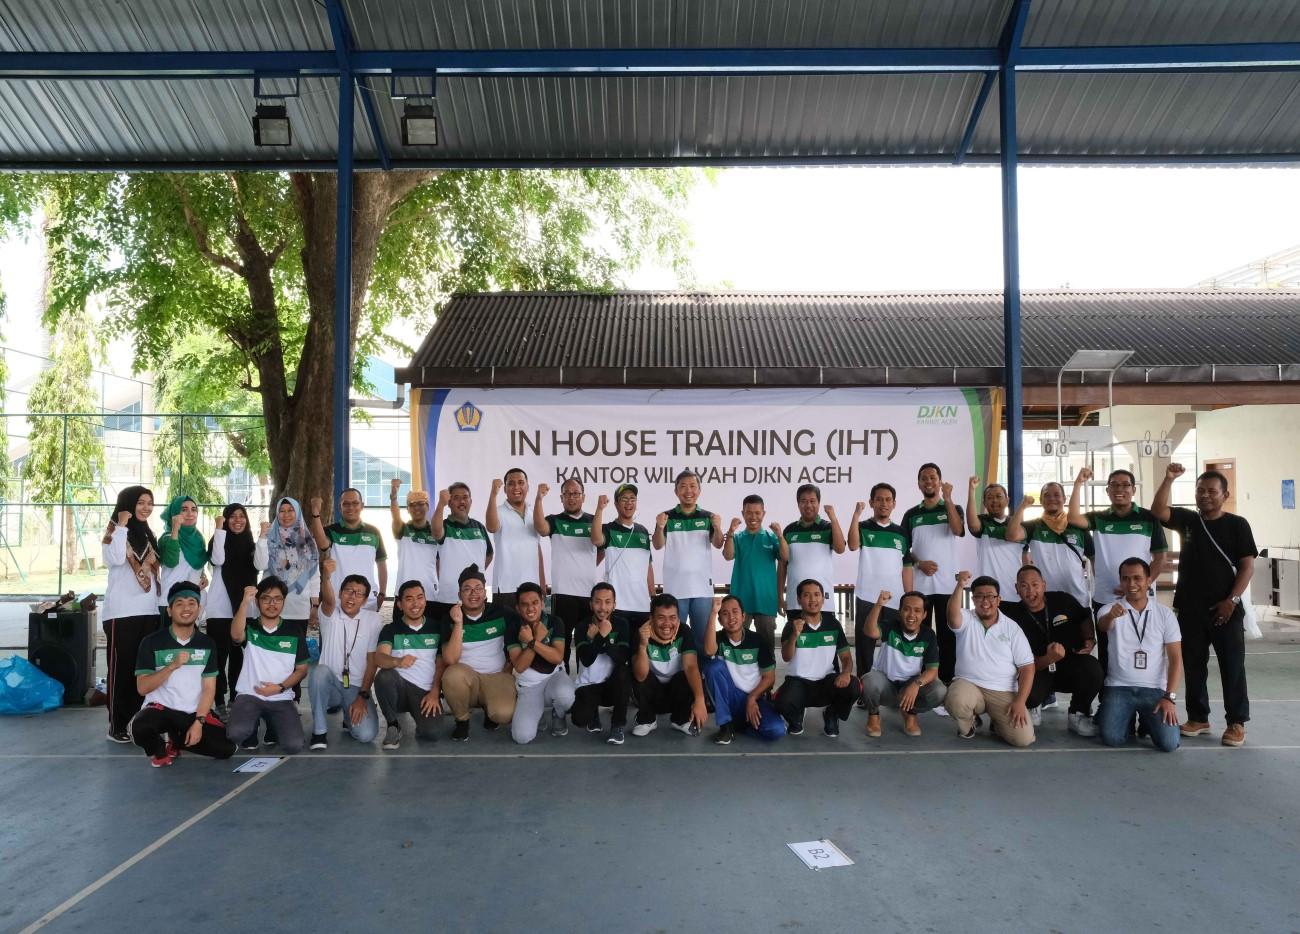 Tingkatkan Sinergi Antar Pegawai, Insan DJKN Aceh Ikuti Pelatihan In House Training (IHT)